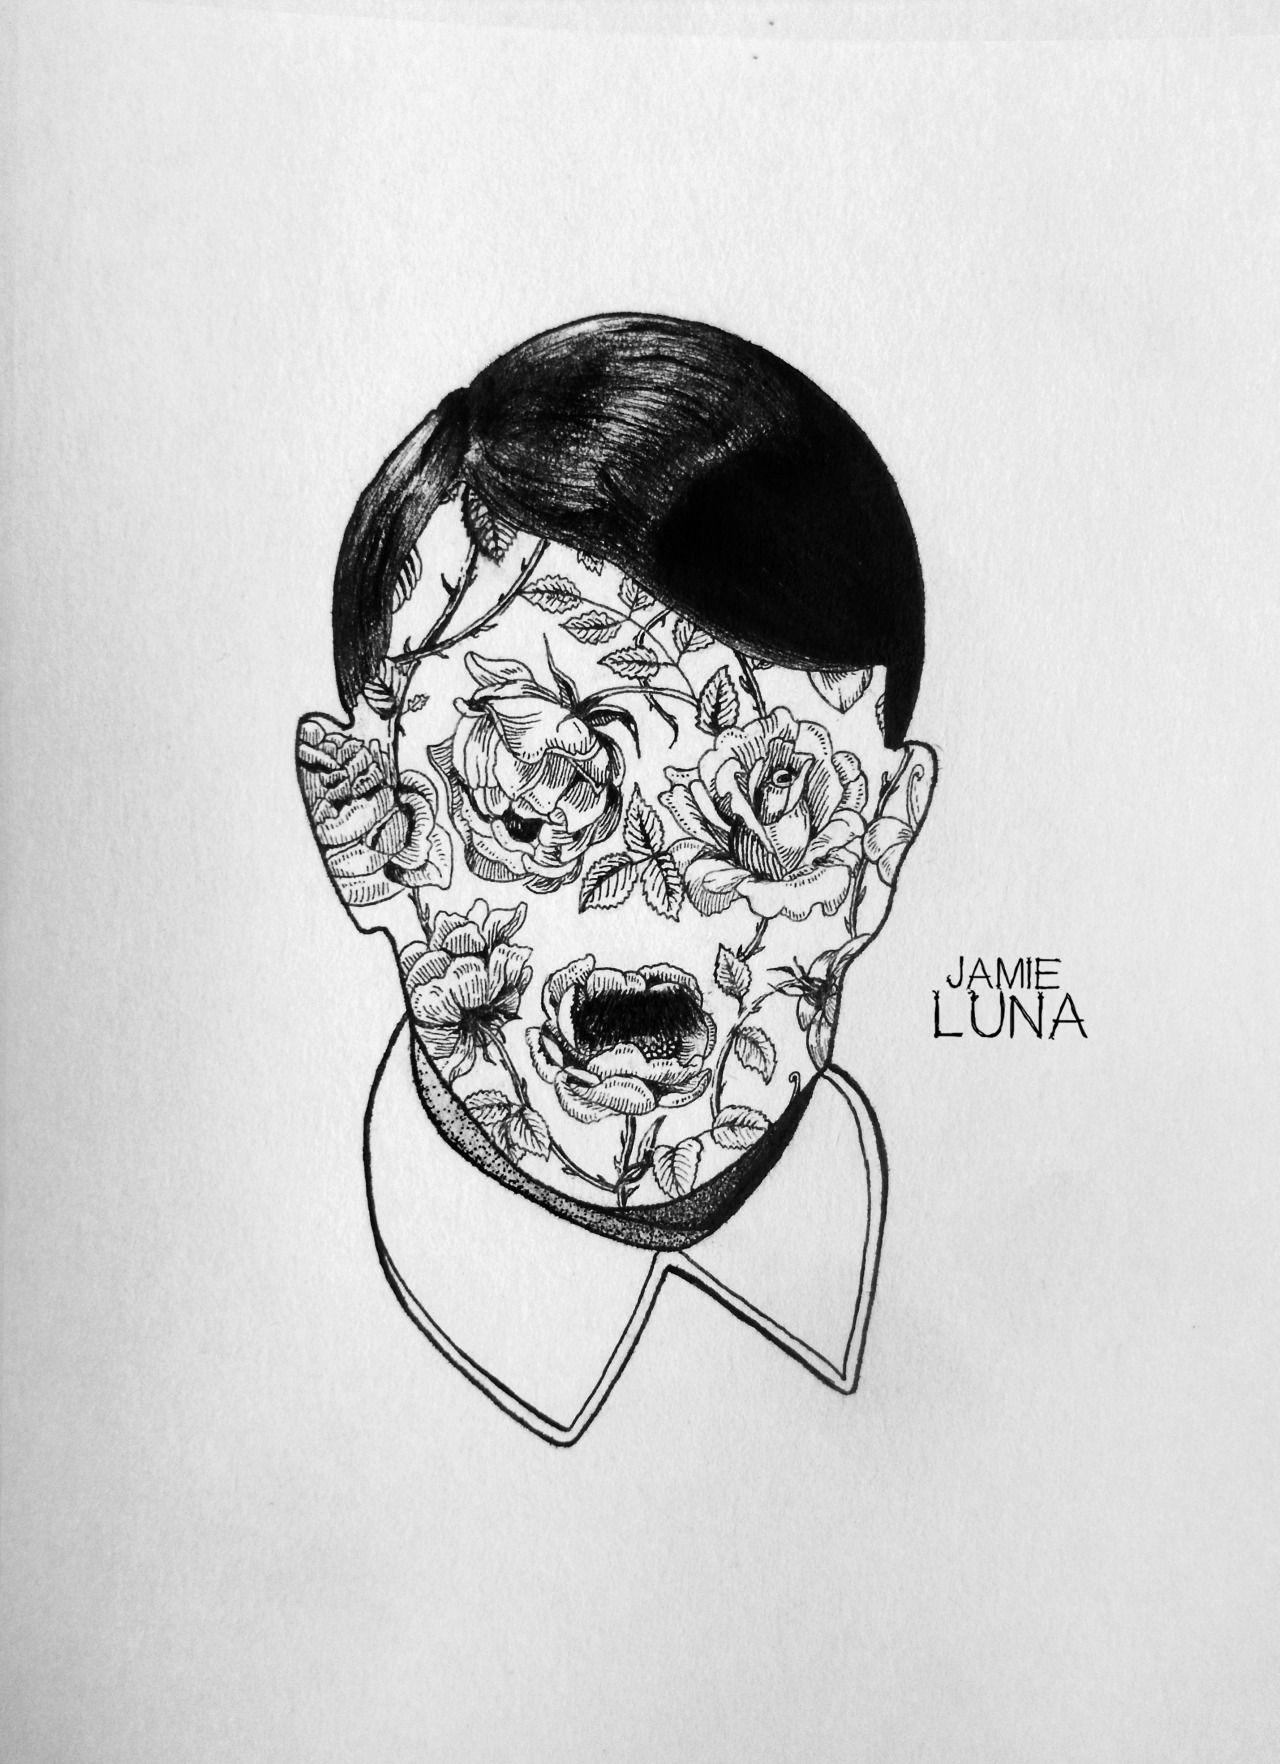 JAMIE LUNA Tattooist, Designer, Illustrator from Kiev, Ukraine http ...